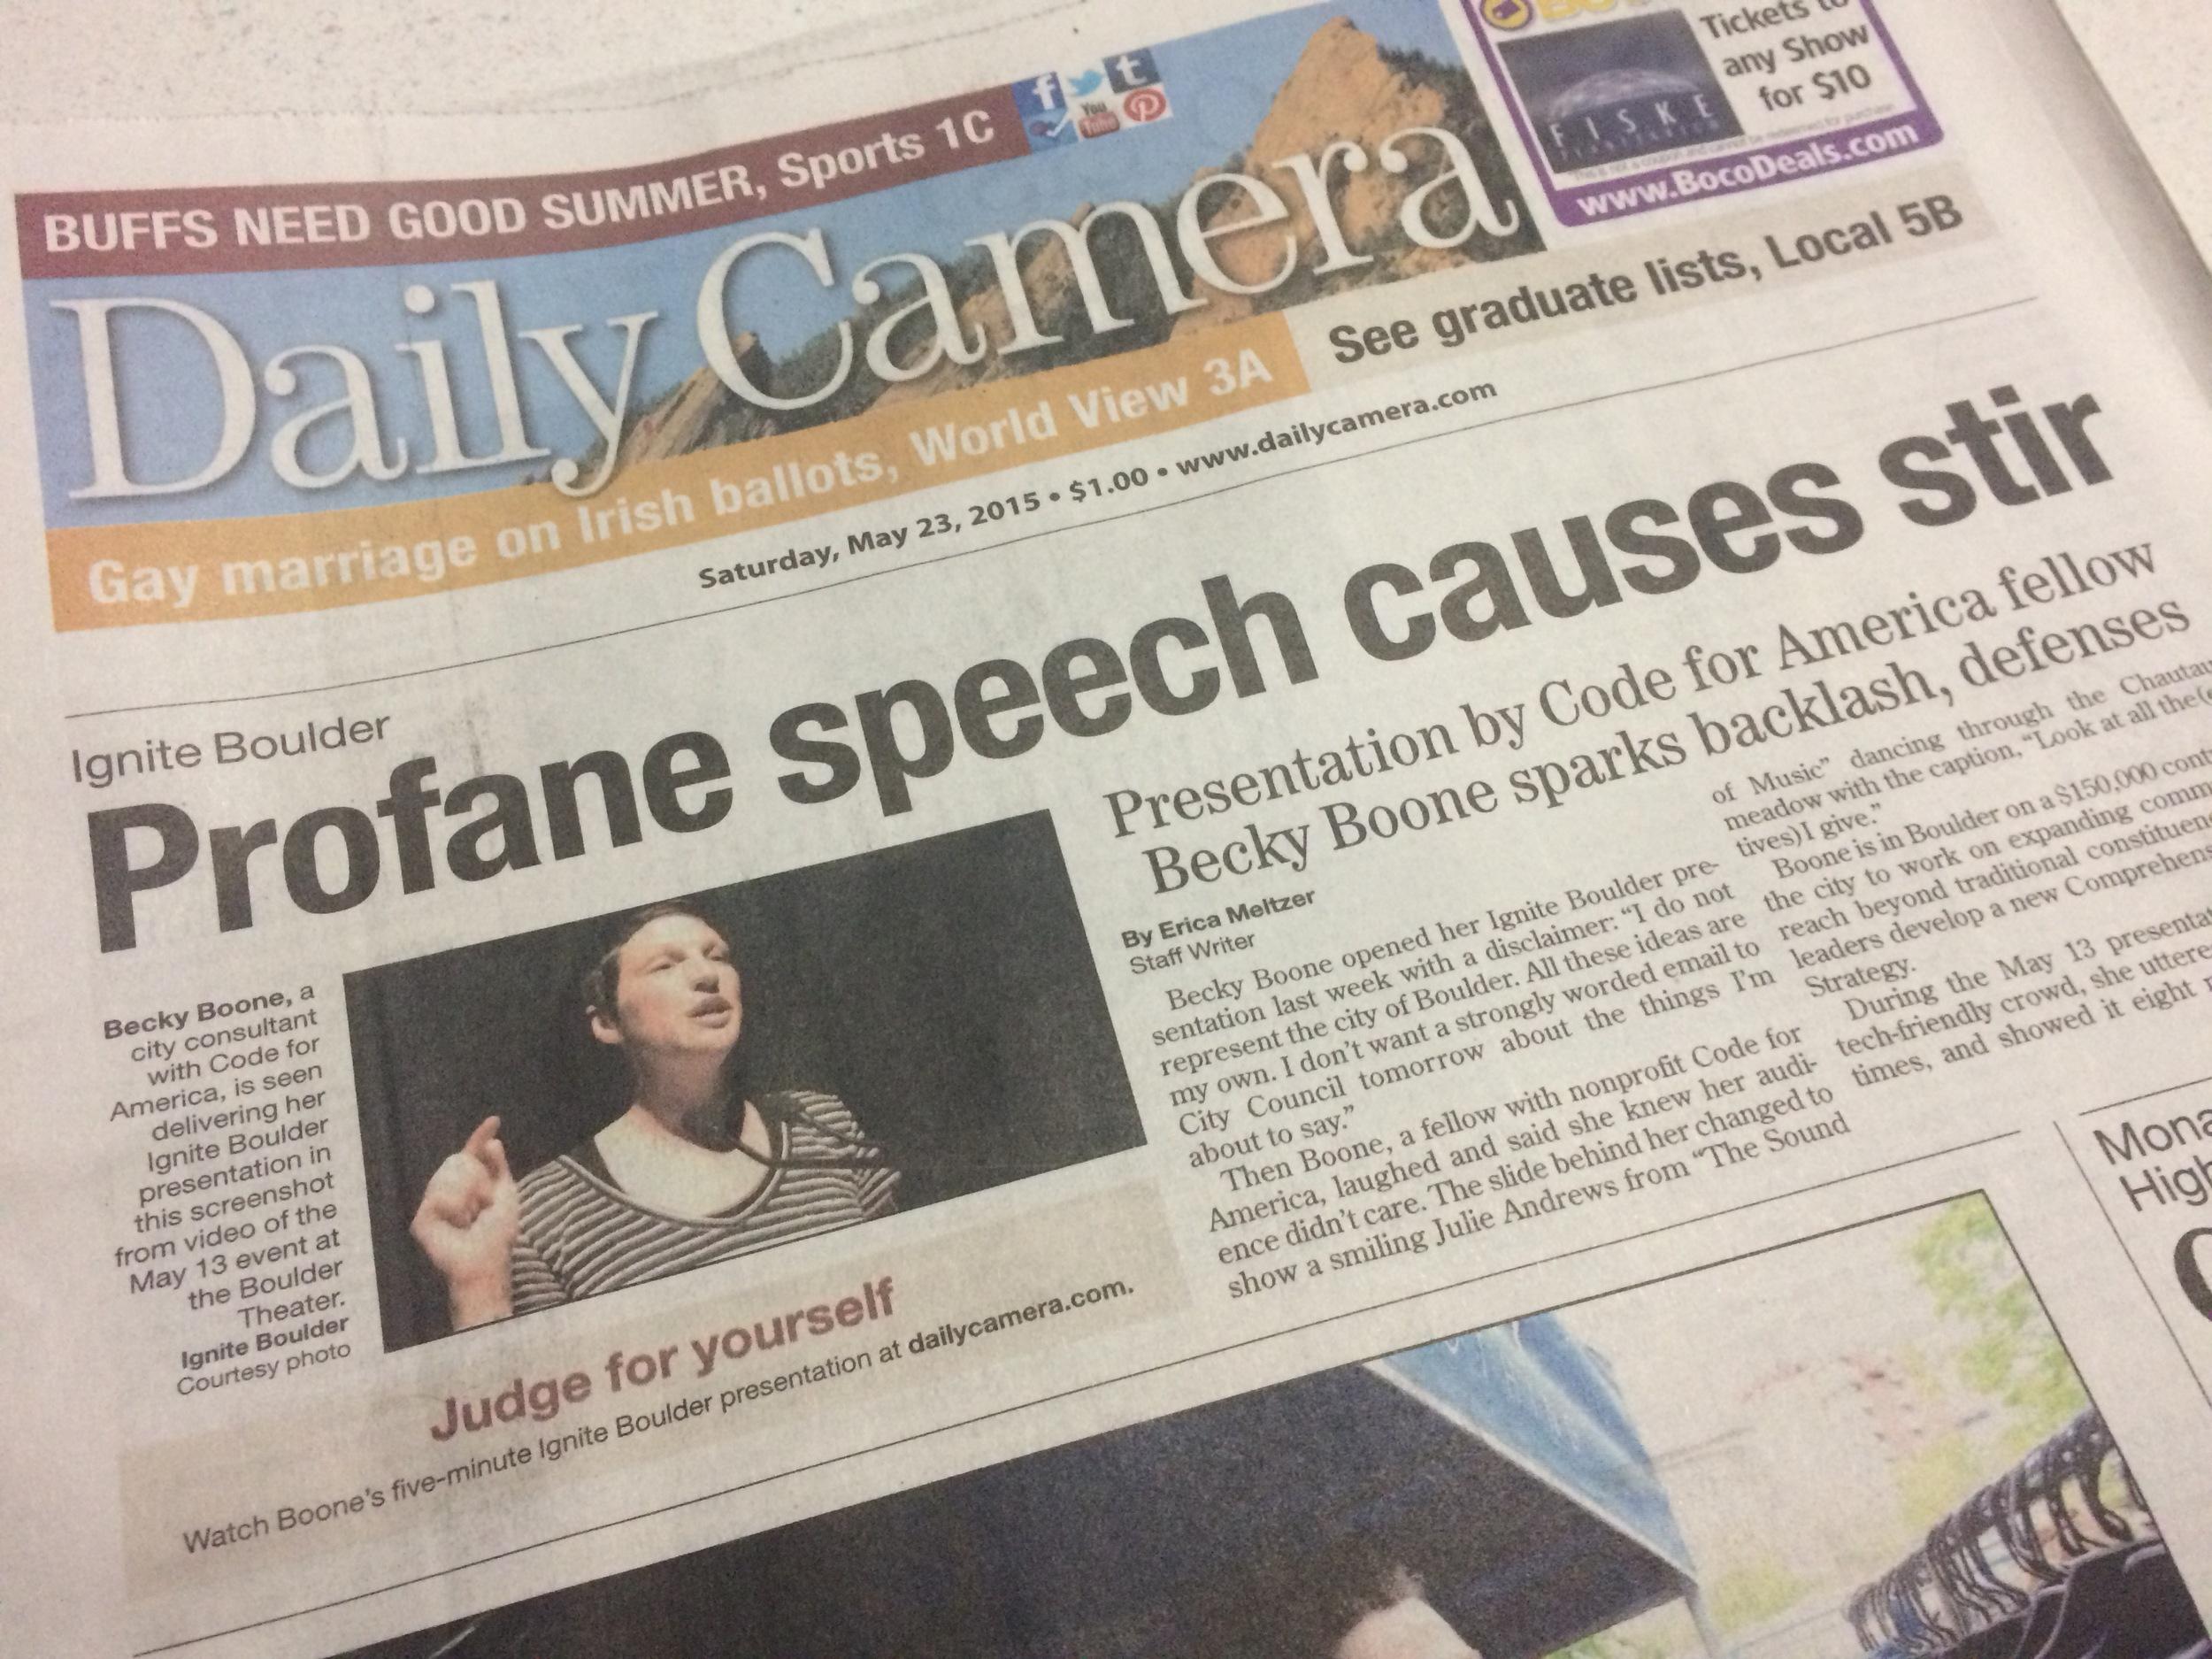 profance_speech_causes_stir.jpg